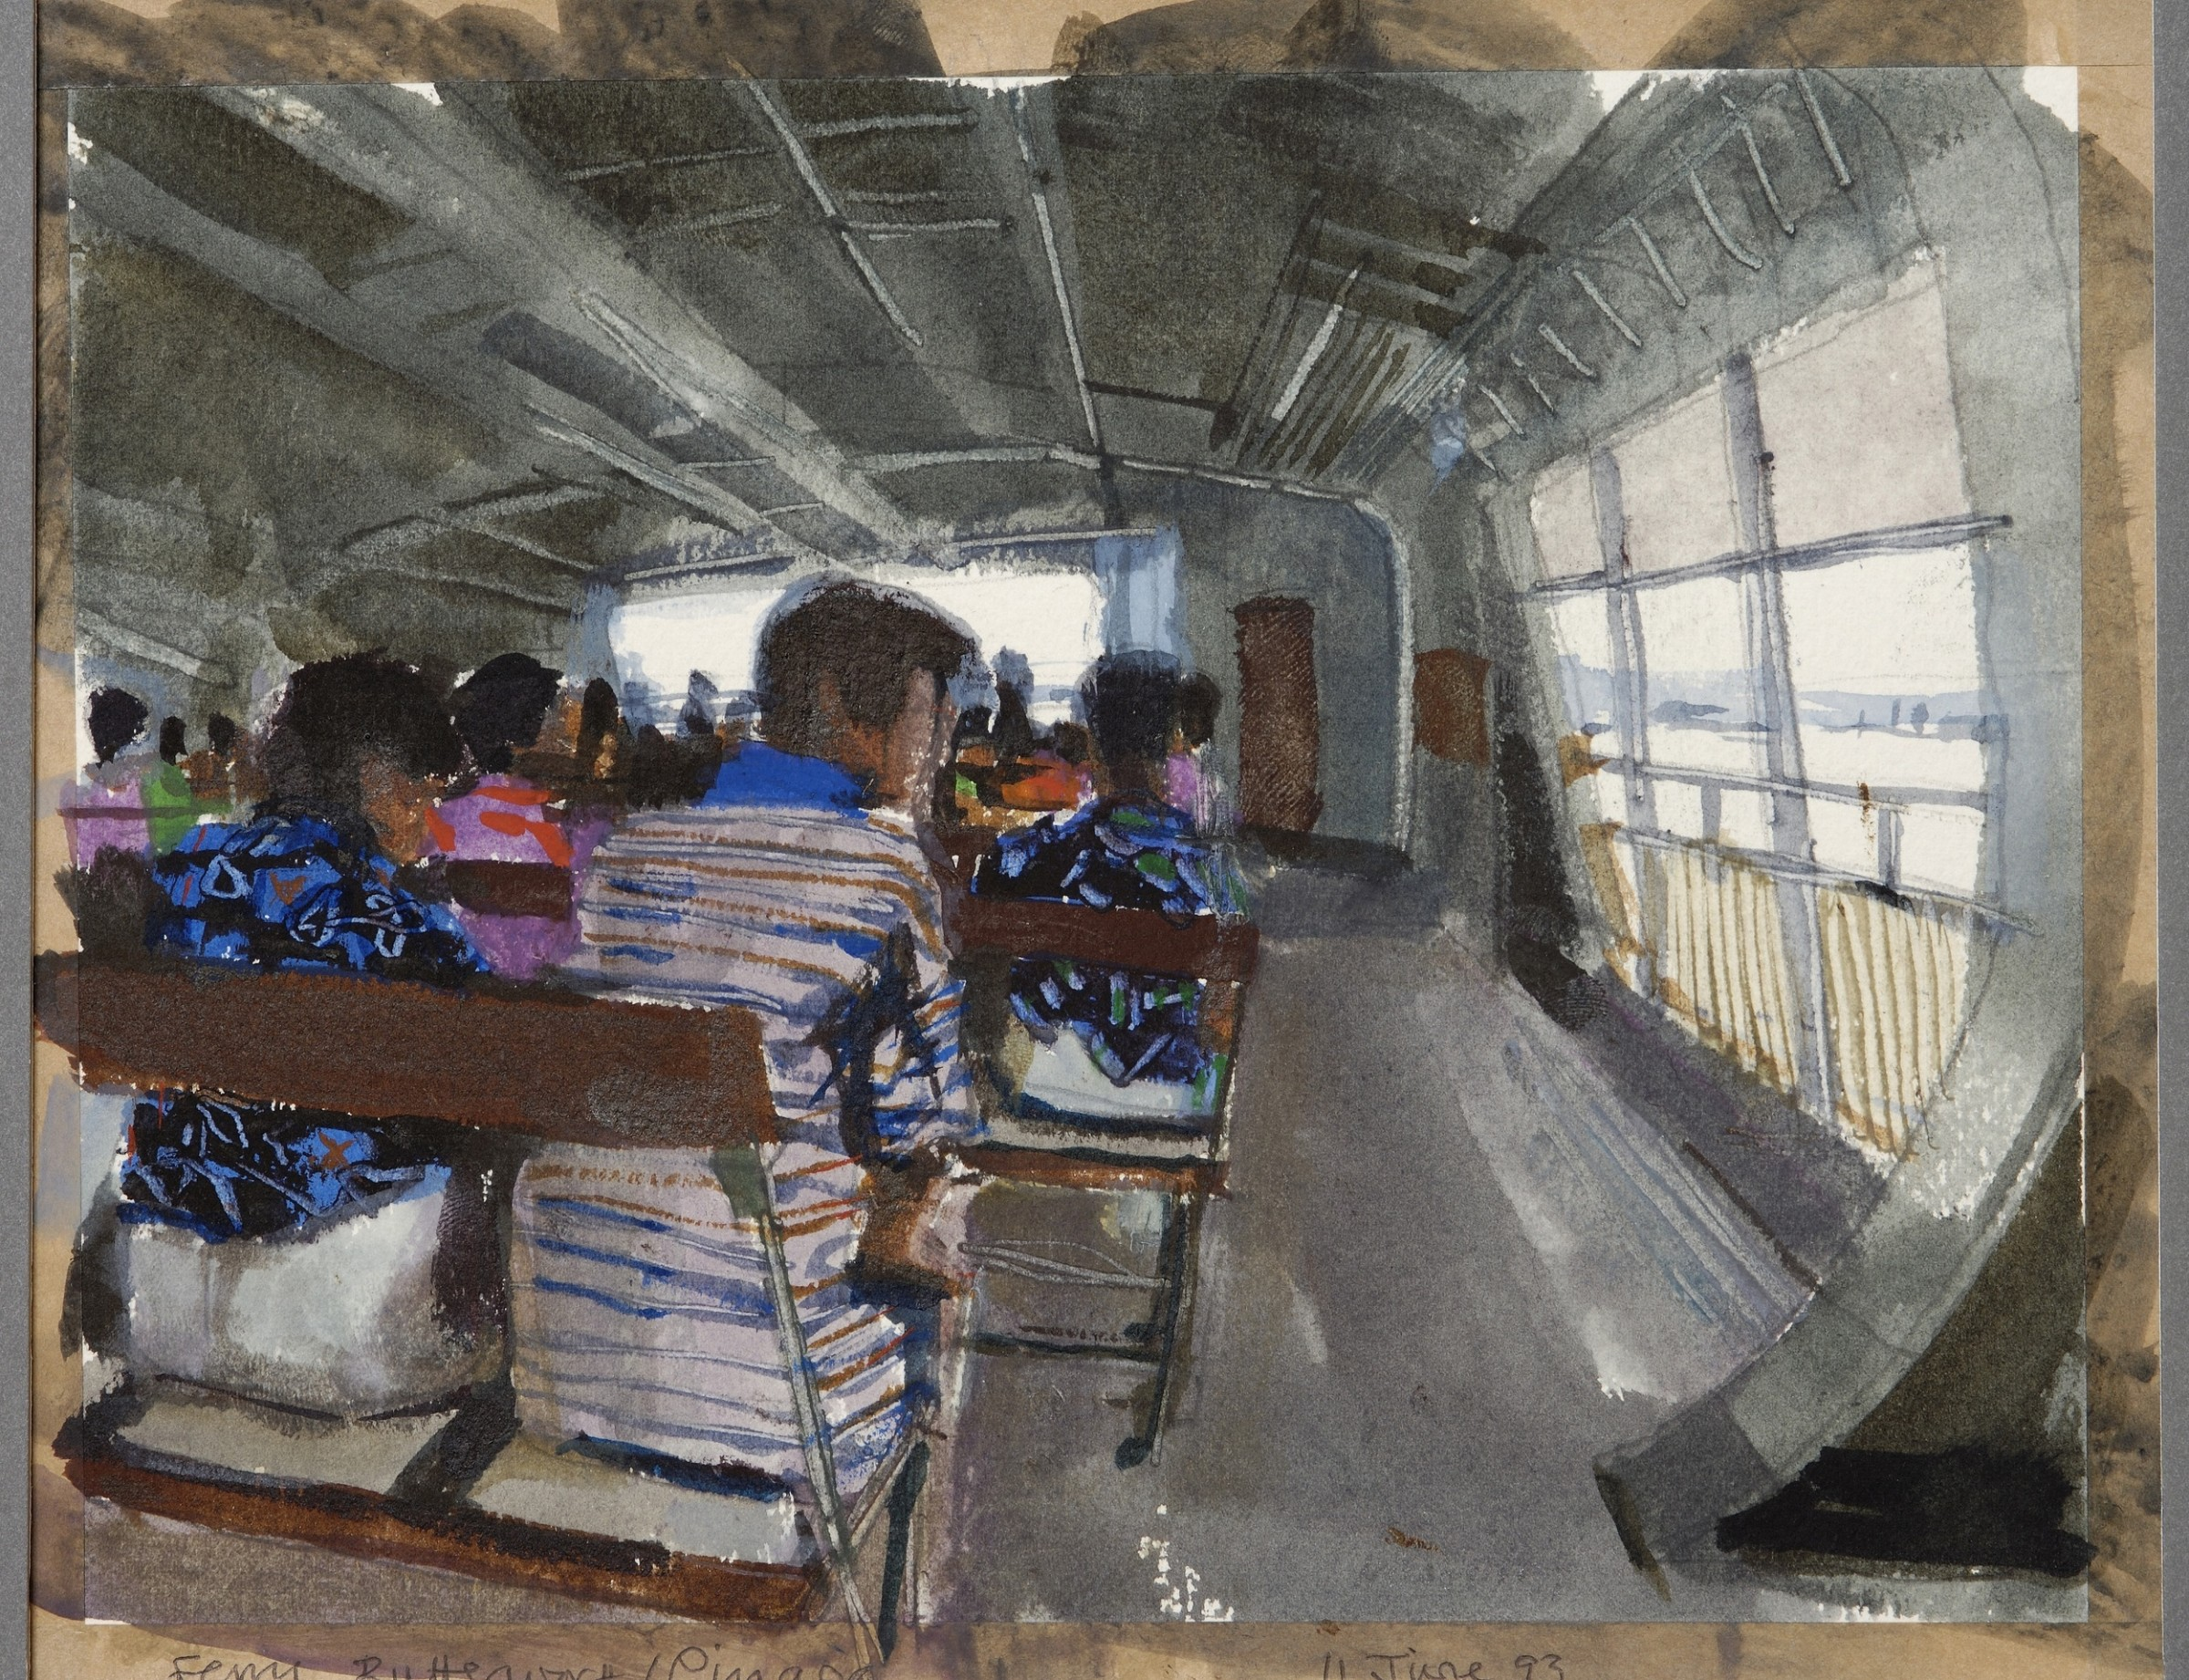 <span class=&#34;link fancybox-details-link&#34;><a href=&#34;/exhibitions/24/works/artworks_standalone10756/&#34;>View Detail Page</a></span><div class=&#34;artist&#34;><span class=&#34;artist&#34;><strong>John Newberry</strong></span></div><div class=&#34;title&#34;><em>Butterworth Ferry, Penang</em></div><div class=&#34;medium&#34;>watercolour</div><div class=&#34;dimensions&#34;>37x43cm</div>